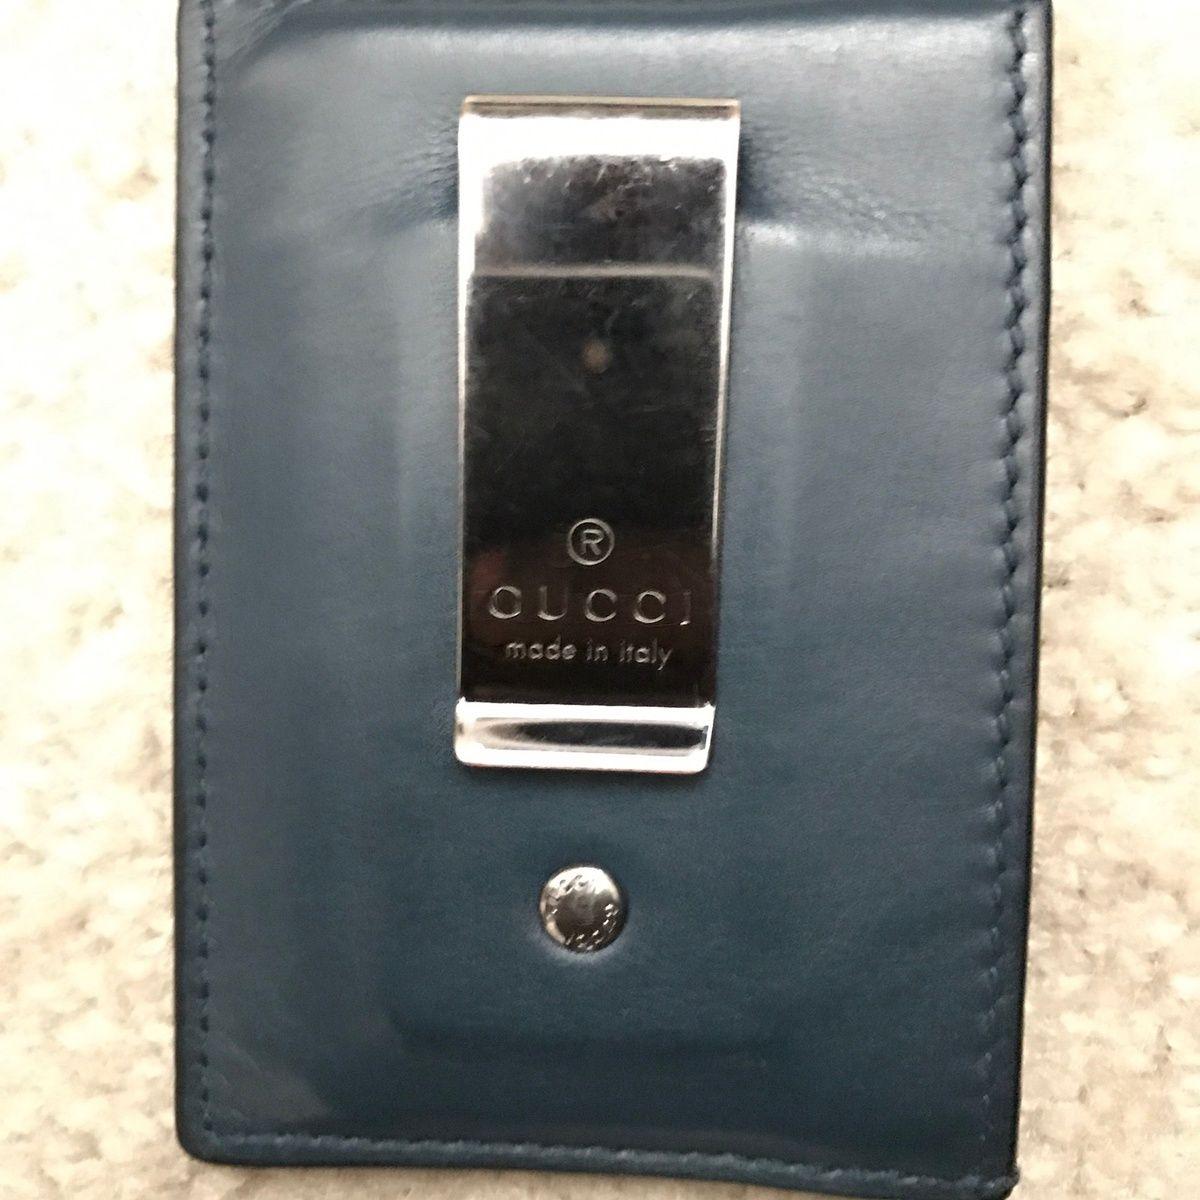 Gucci Gucci Signature Money Clip Size one size - Miscellaneous for Sale - Grailed